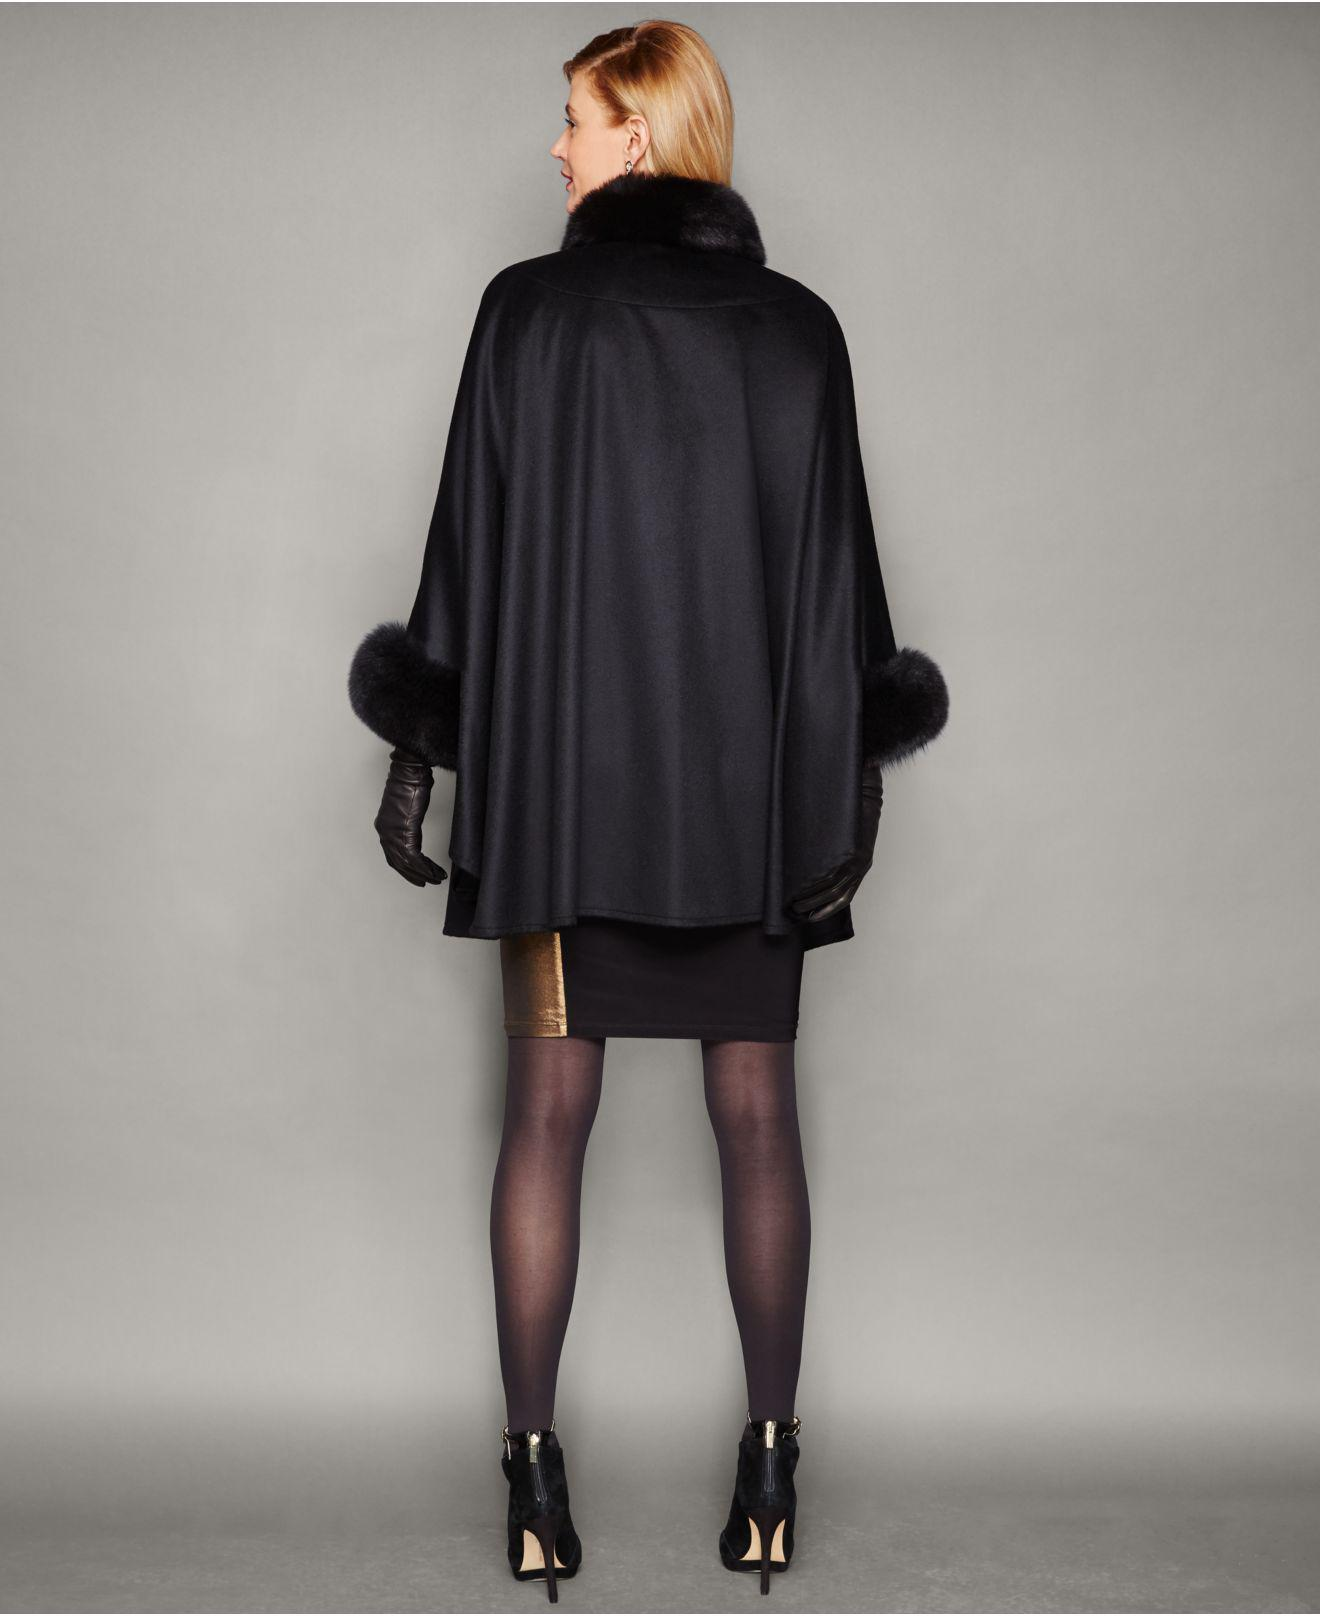 b42233a04f6 Lyst - The Fur Vault Fox-trim Cashmere Cape in Black